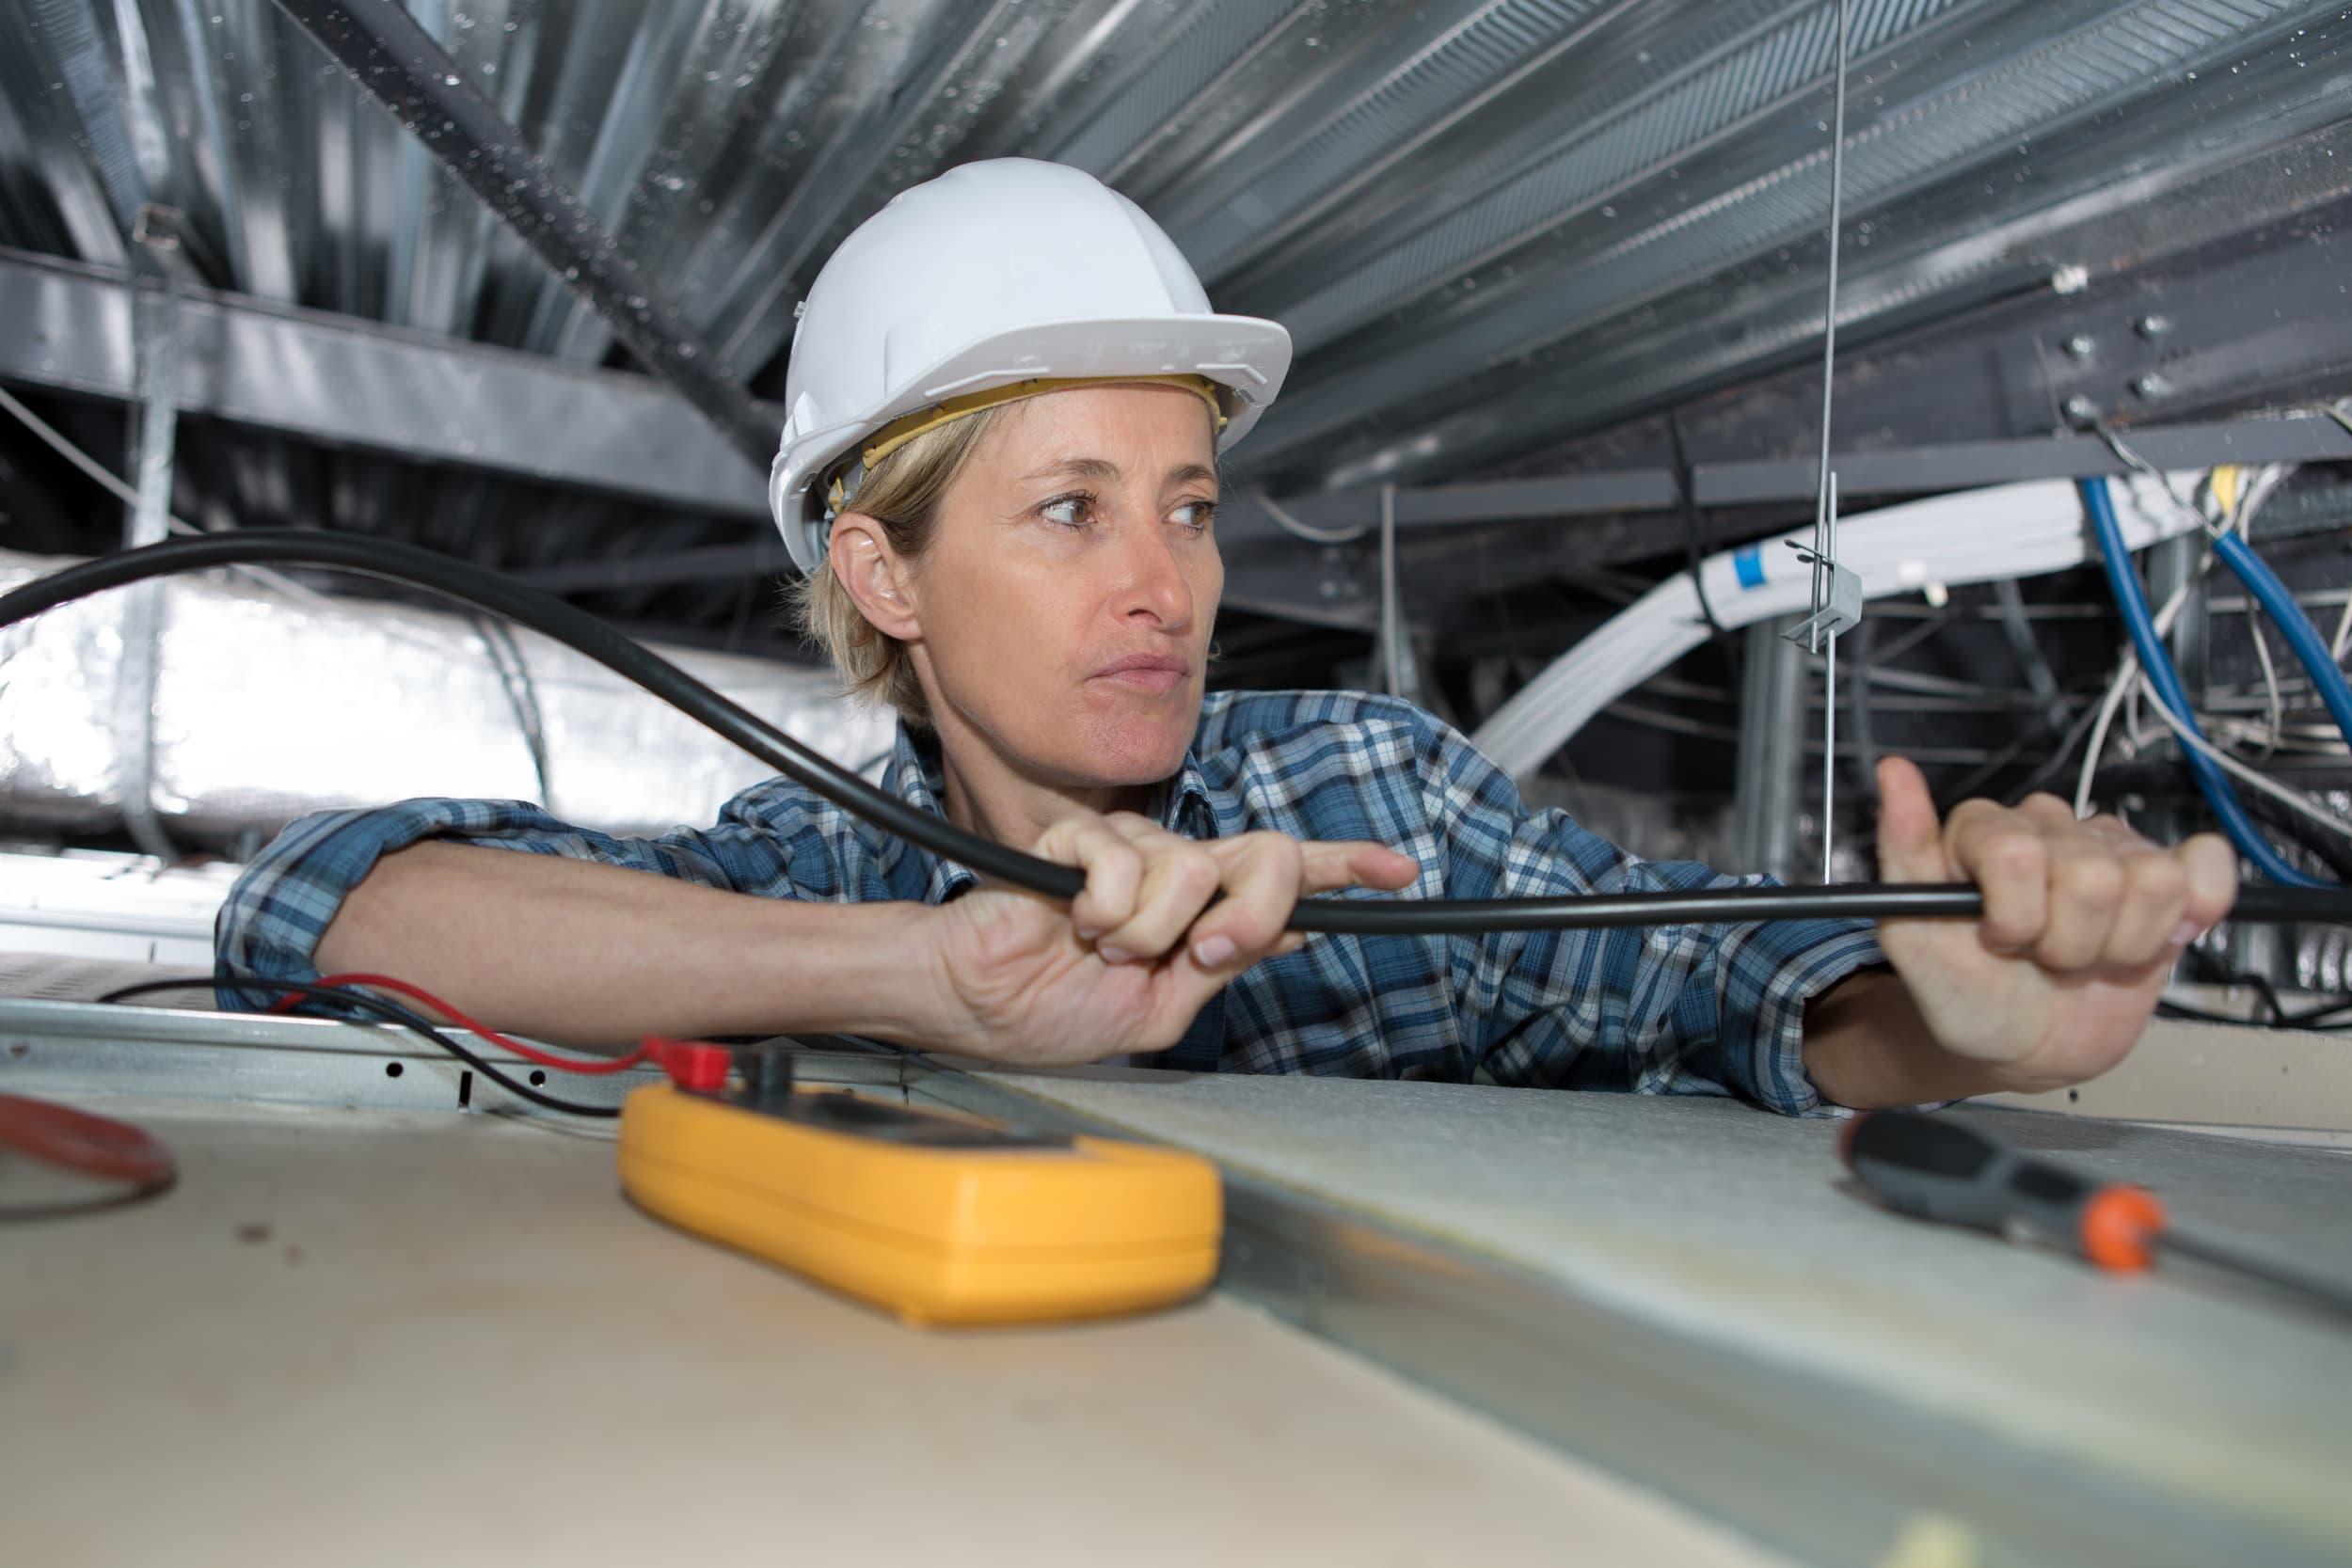 Compliance Training Online Construction Confined Spaces course